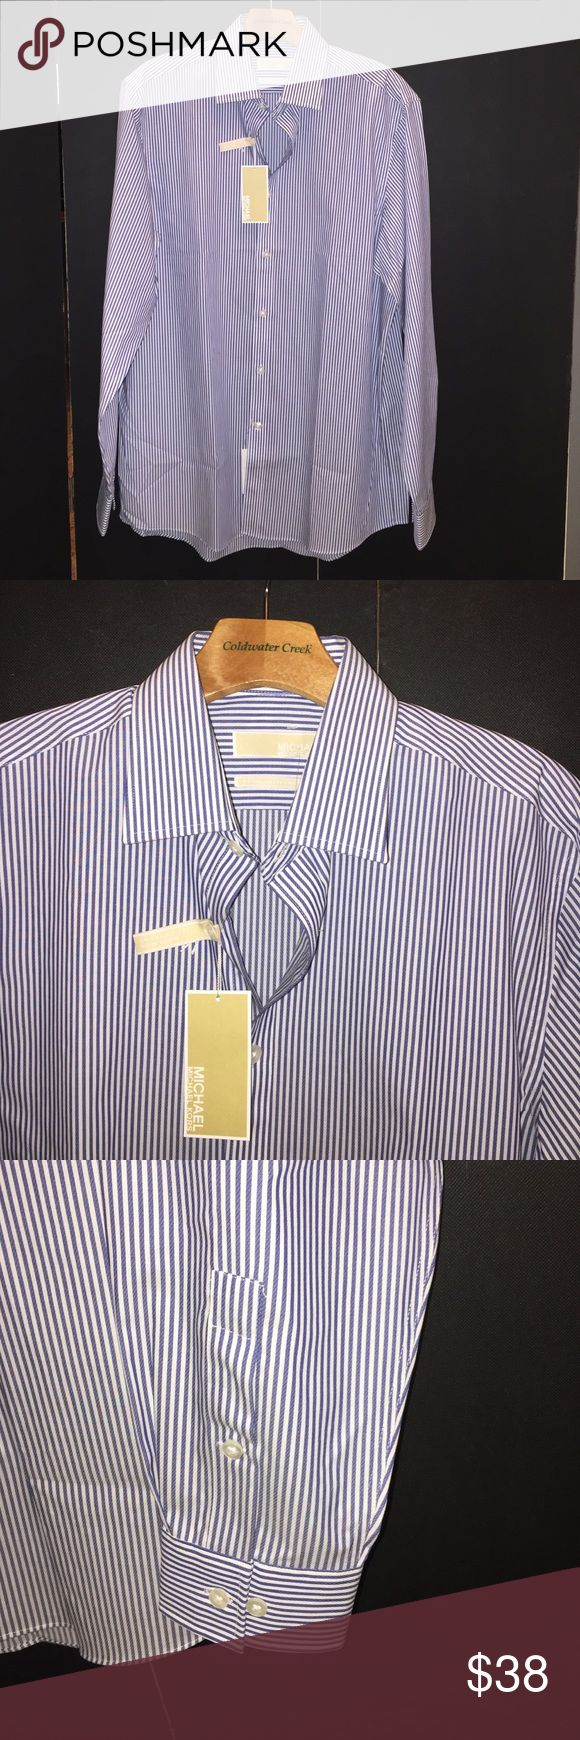 Michael Michael Kors Blue Pin Stripe men shirt Michael Michael Kors men blue strip button down shirt.  Regular - non iron.  Size: 16 34-35 / 100% Cotton MICHAEL Michael Kors Shirts Casual Button Down Shirts